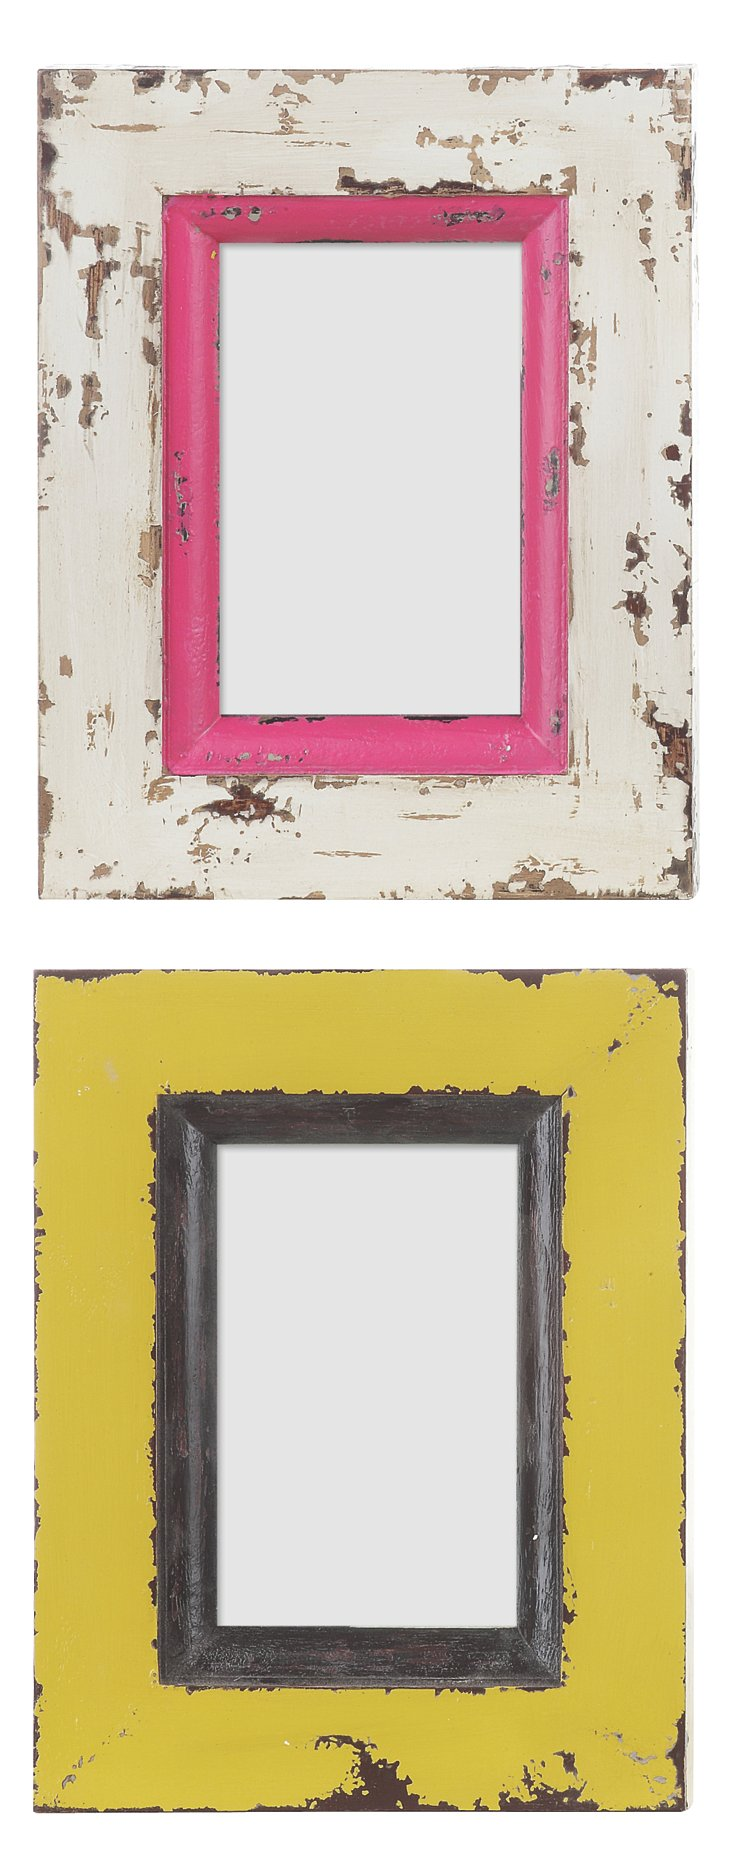 S/2 4x6 Photo Frames